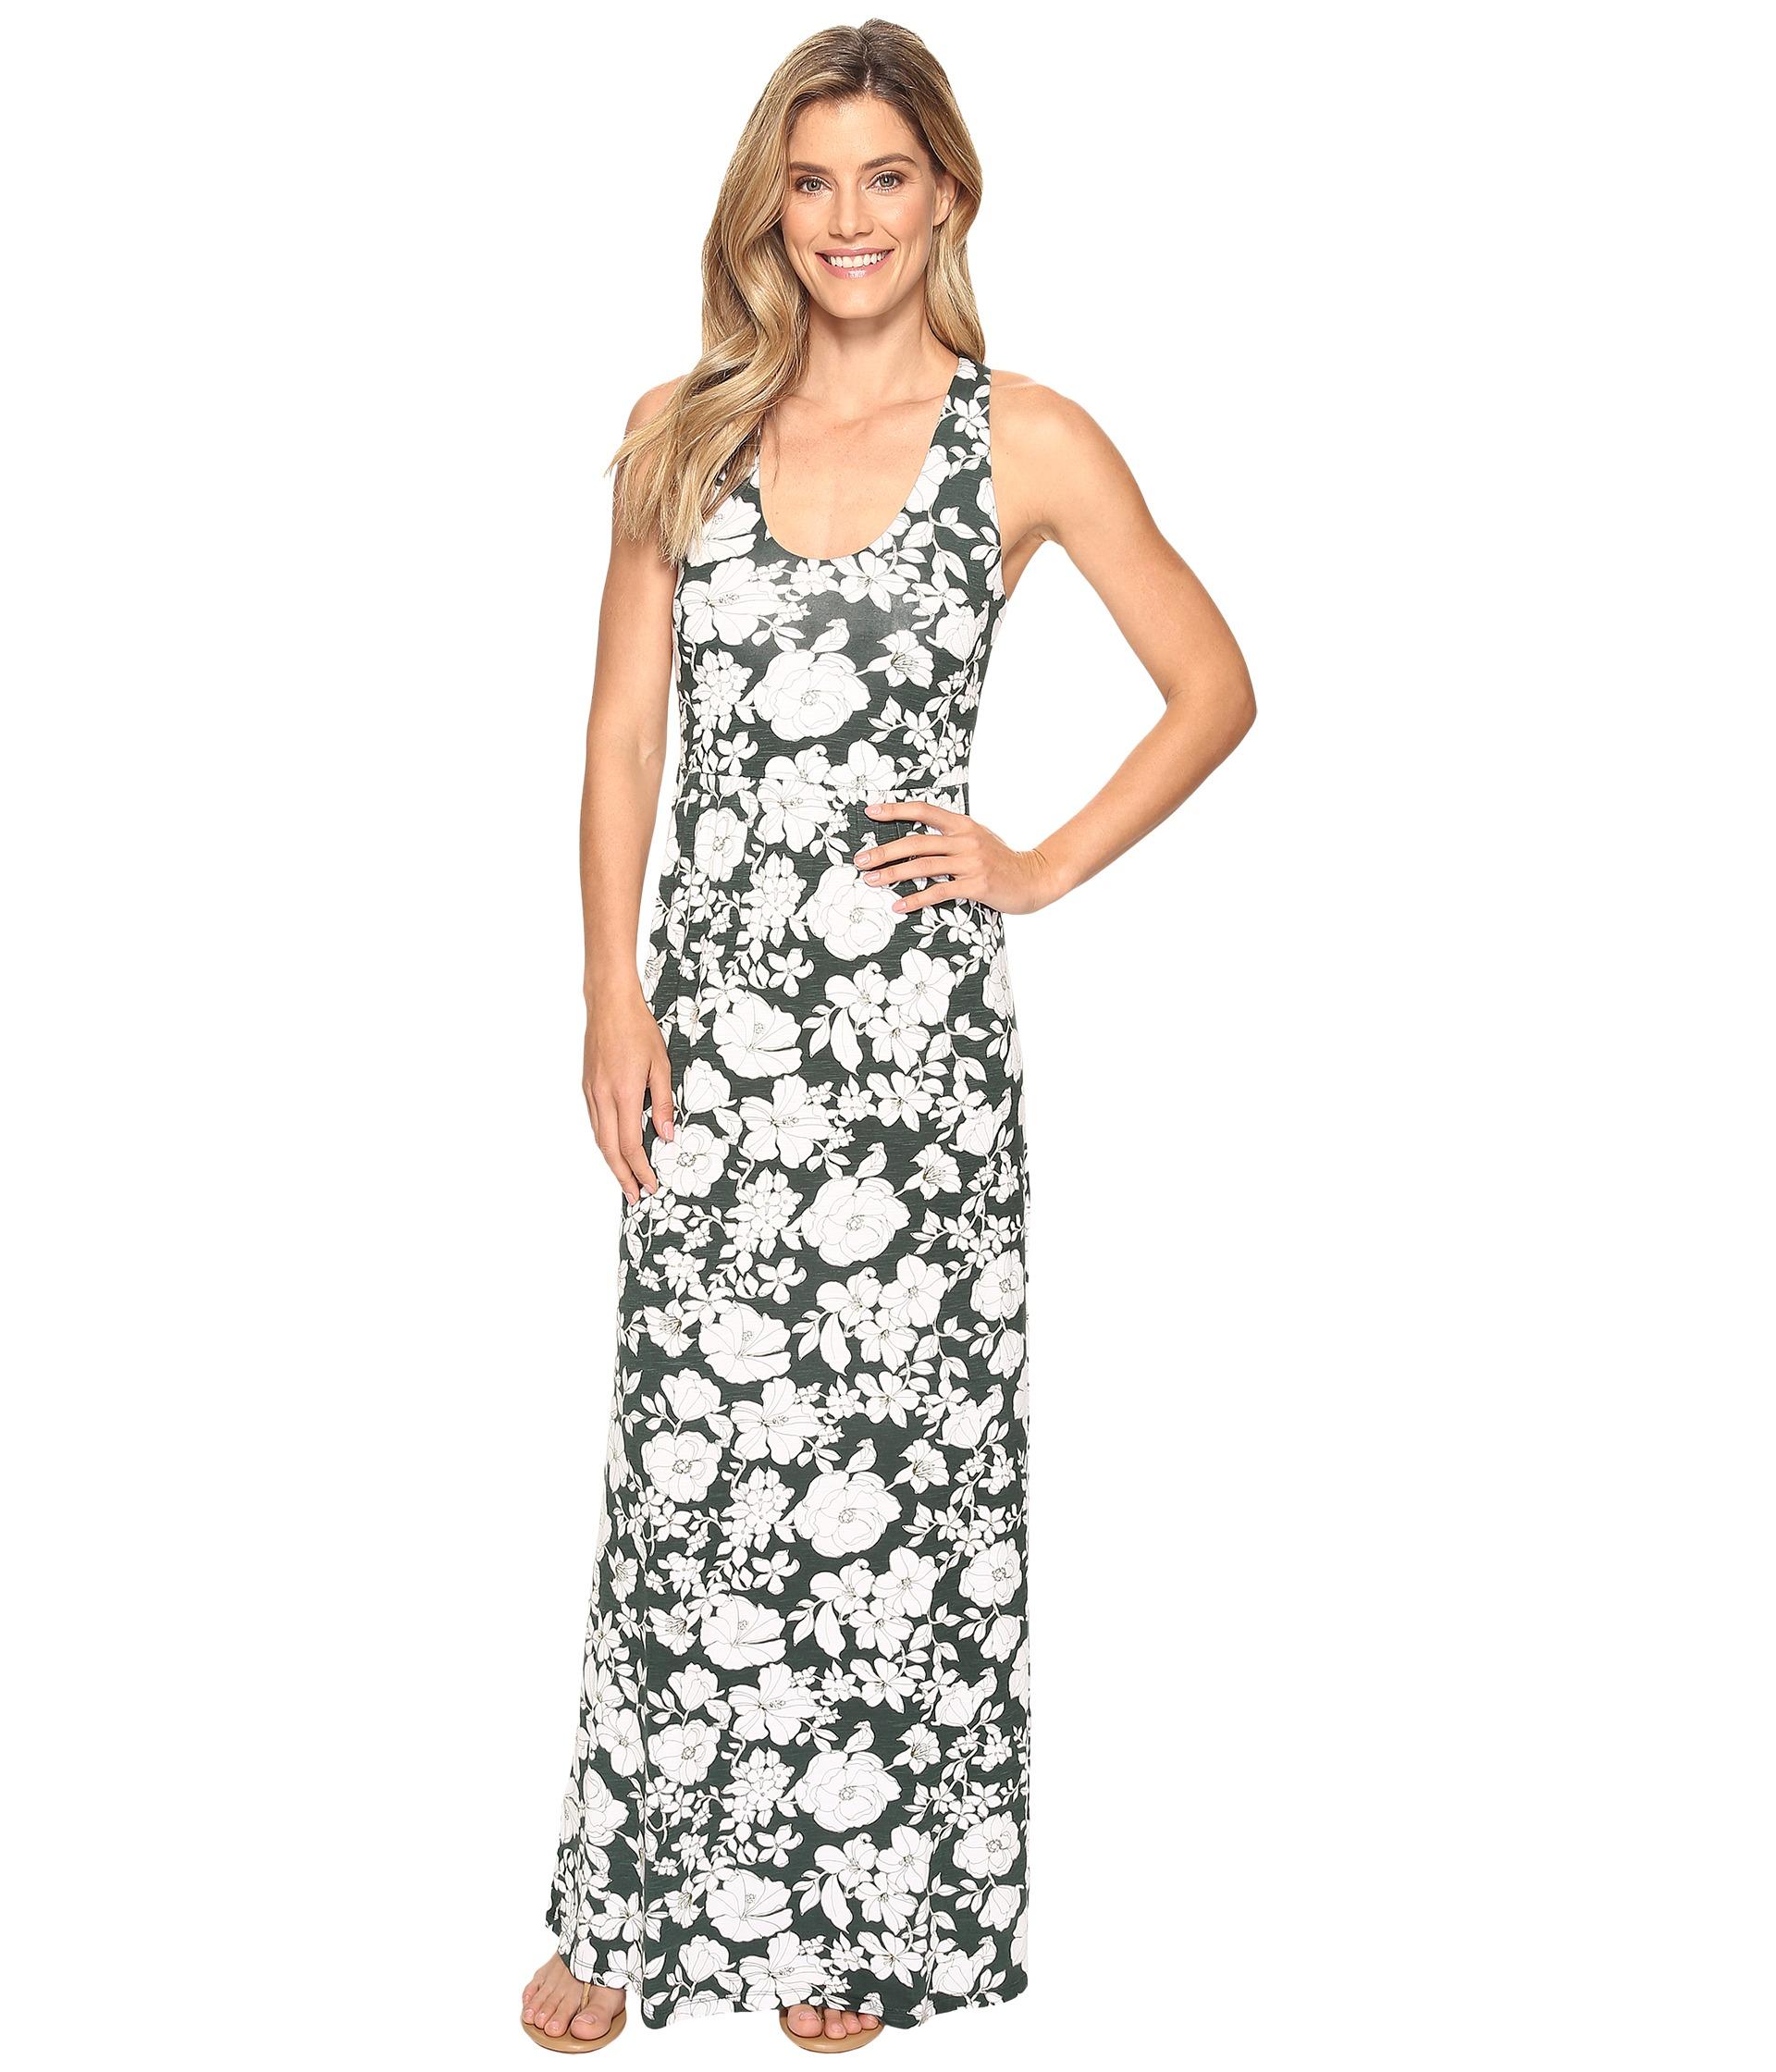 Floral Maxi Dress Clothing  Shipped Free at Zappos